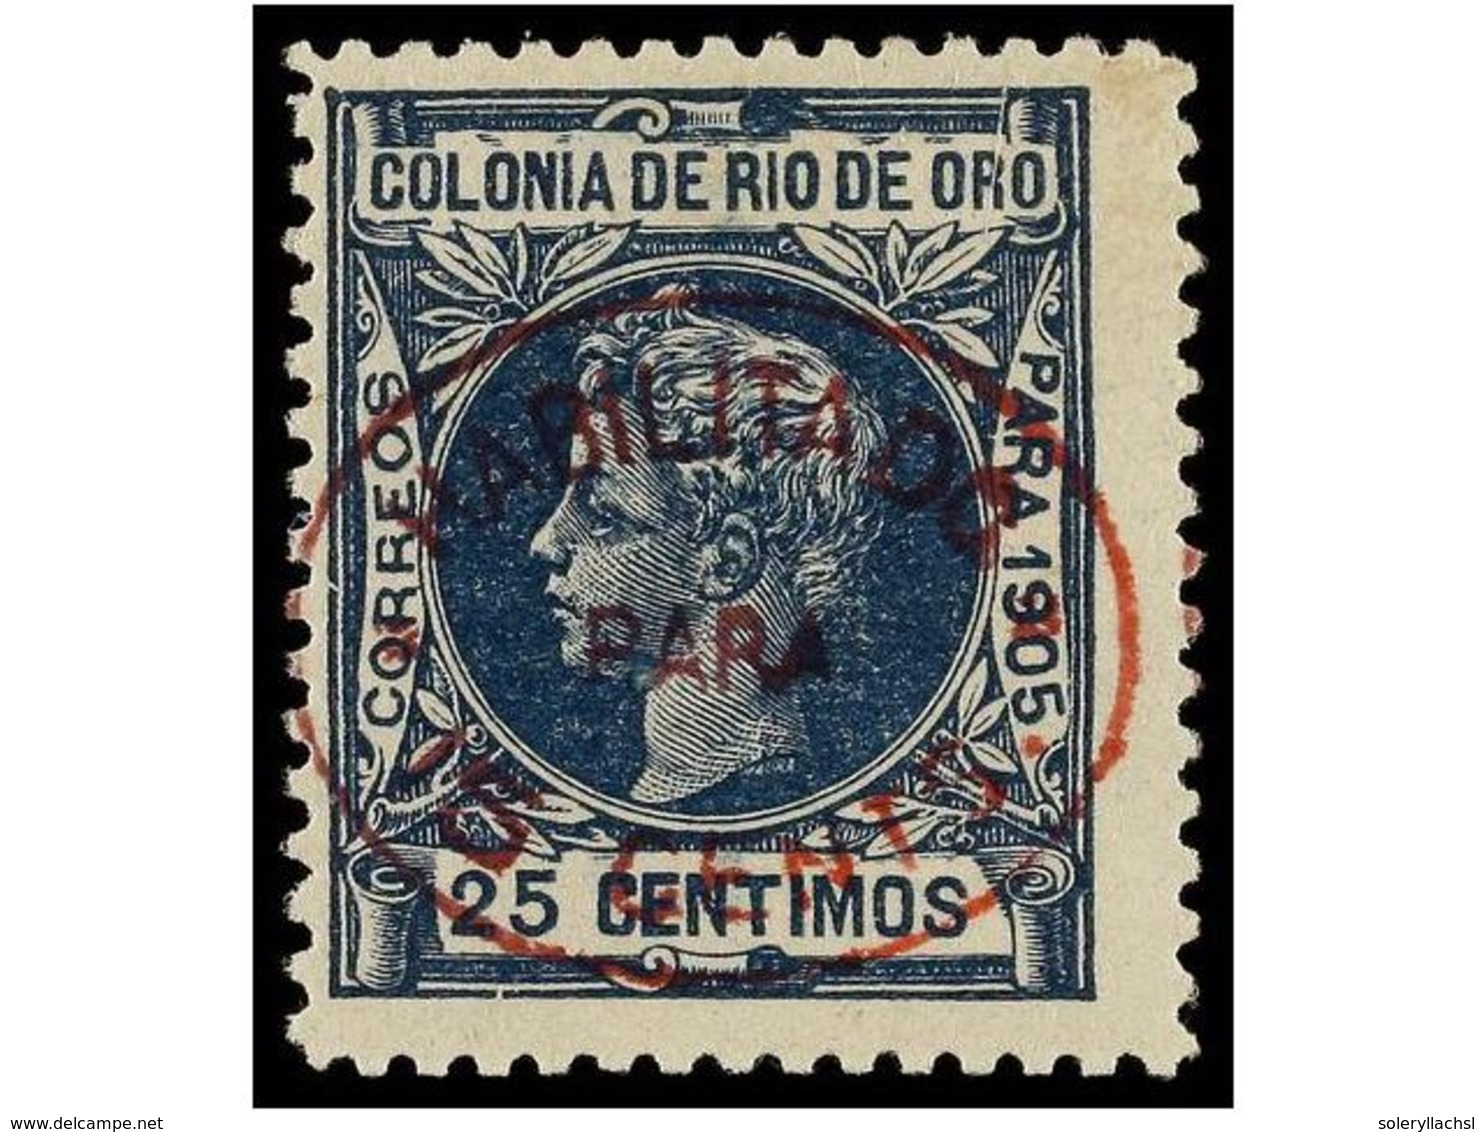 1104 * COLONIAS ESPAÑOLAS: RIO DE ORO. Ed.17. <B>15 Cts. S. 25 Cts.</B> Azul. Habitual Centraje. Cat. 340?. - Stamps